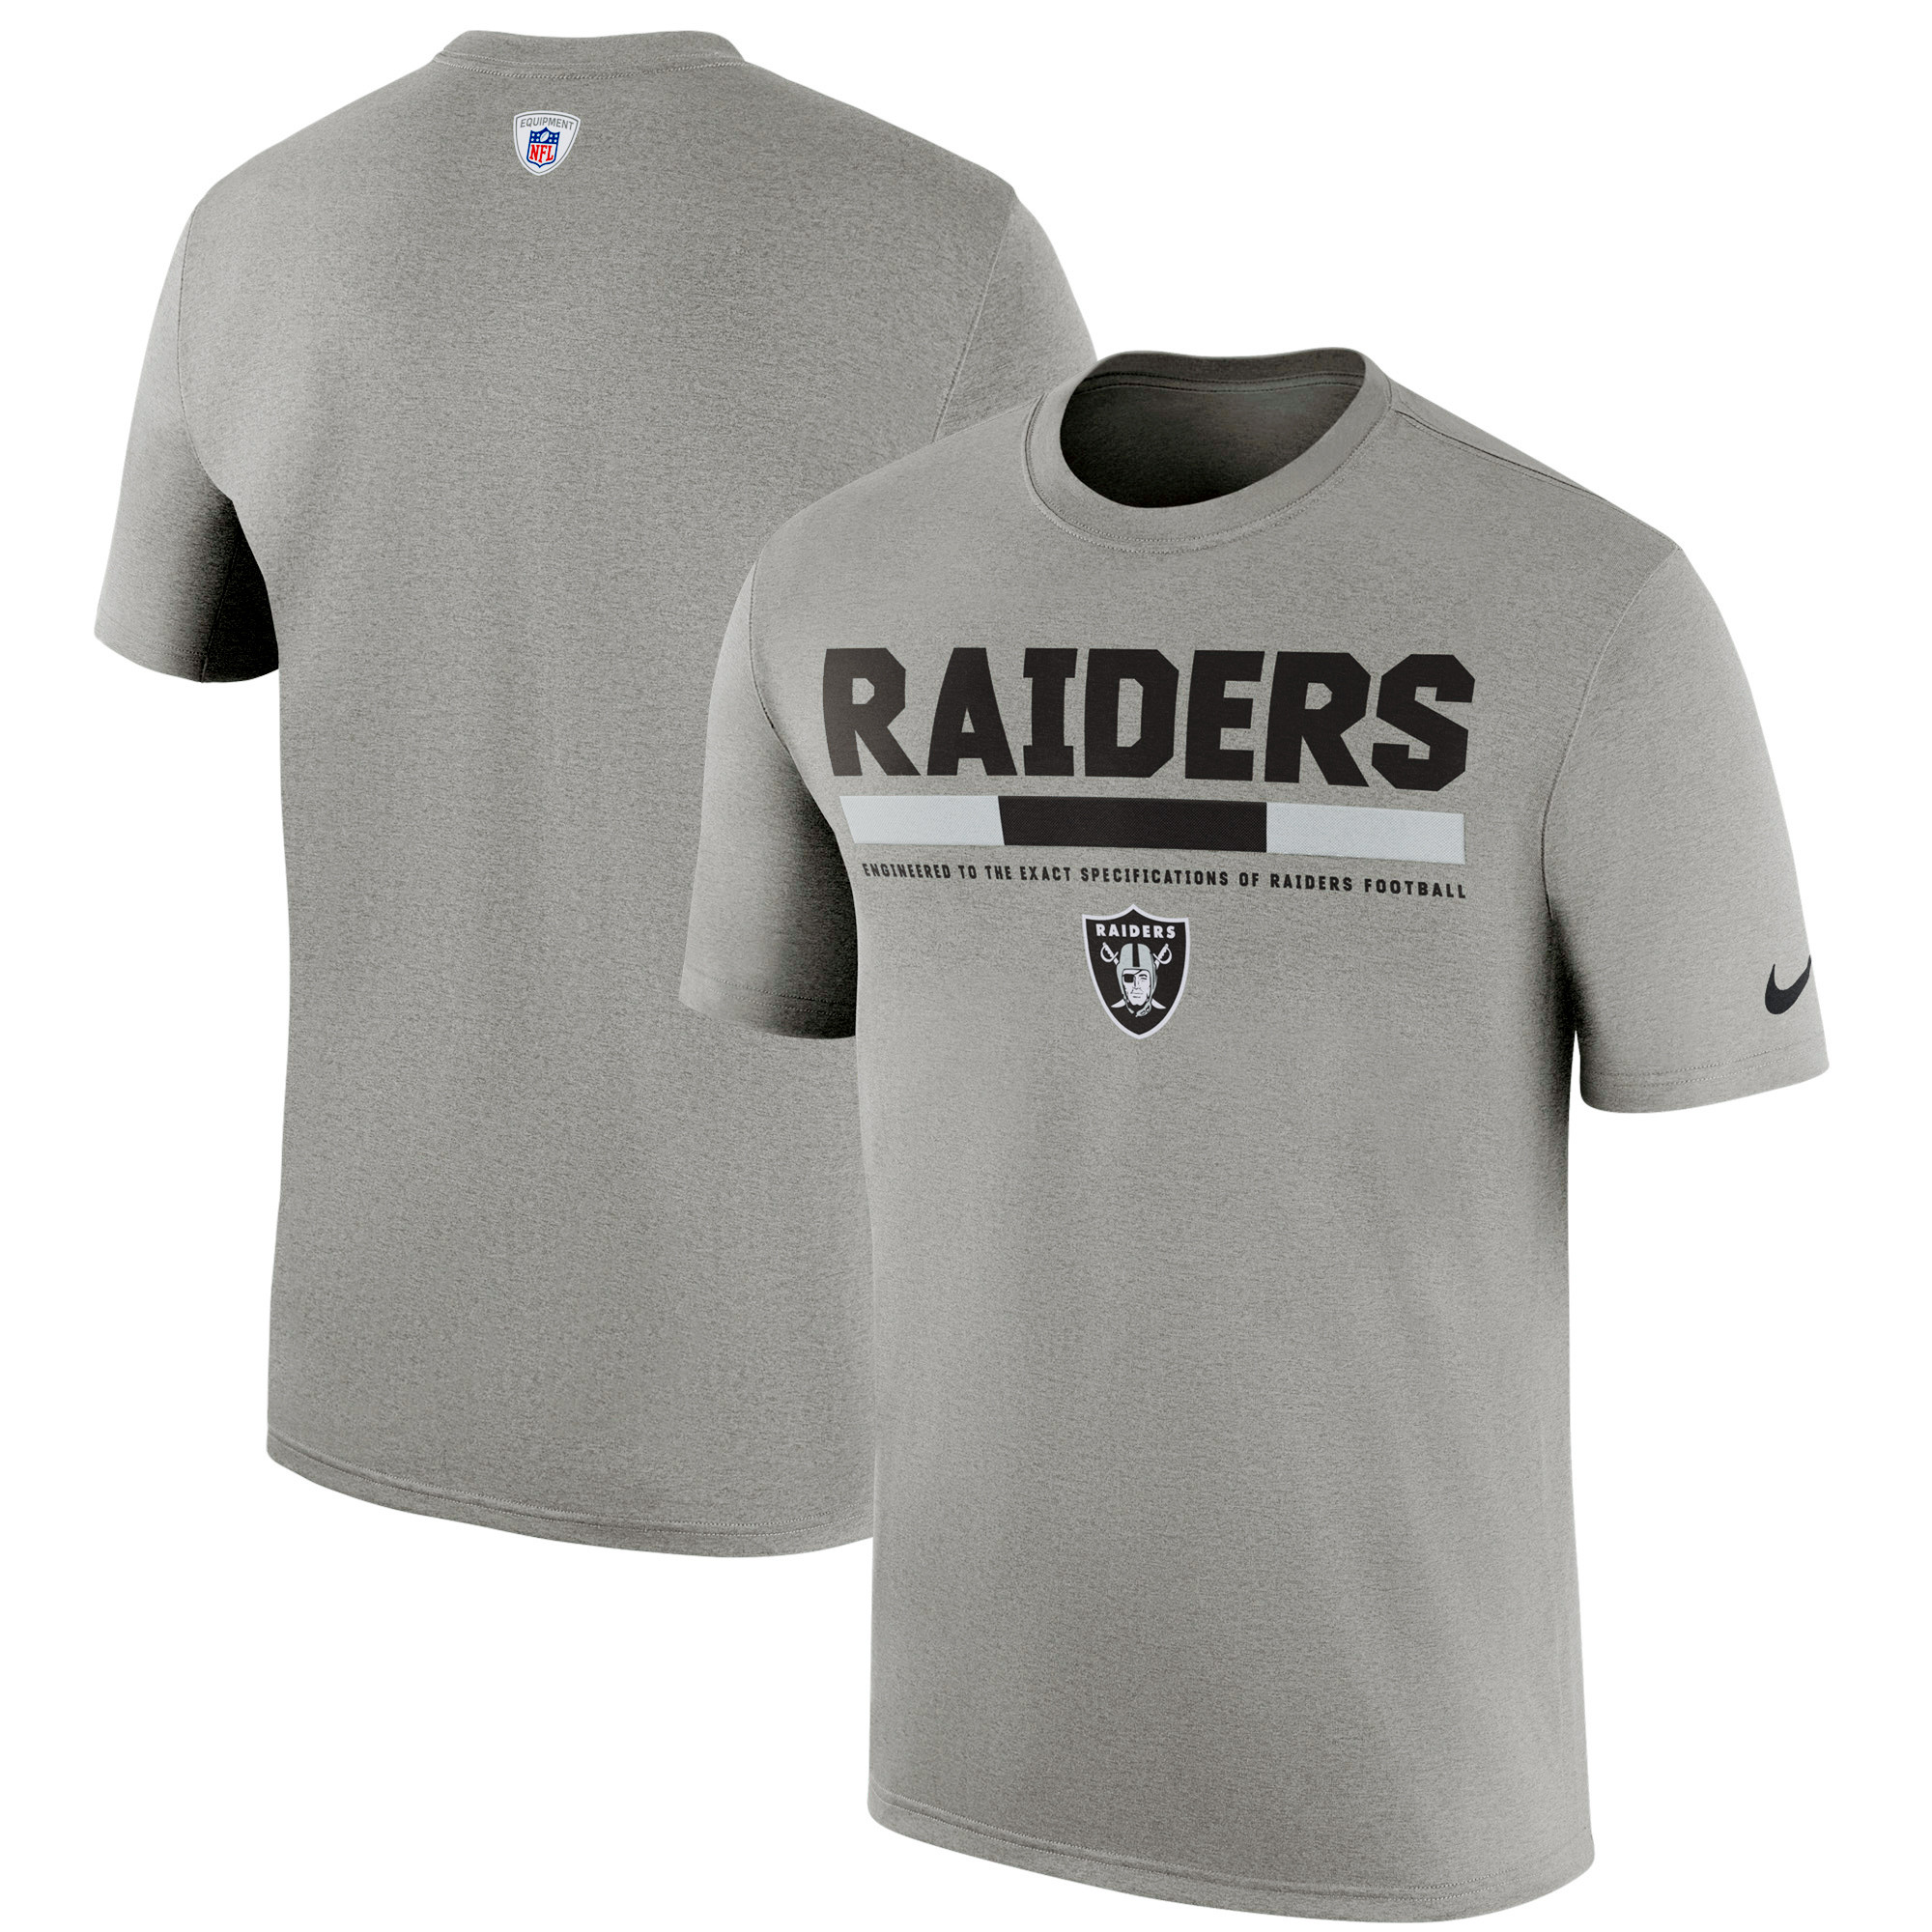 Oakland Raiders Nike Sideline Legend Staff Performance T-Shirt - Charcoal